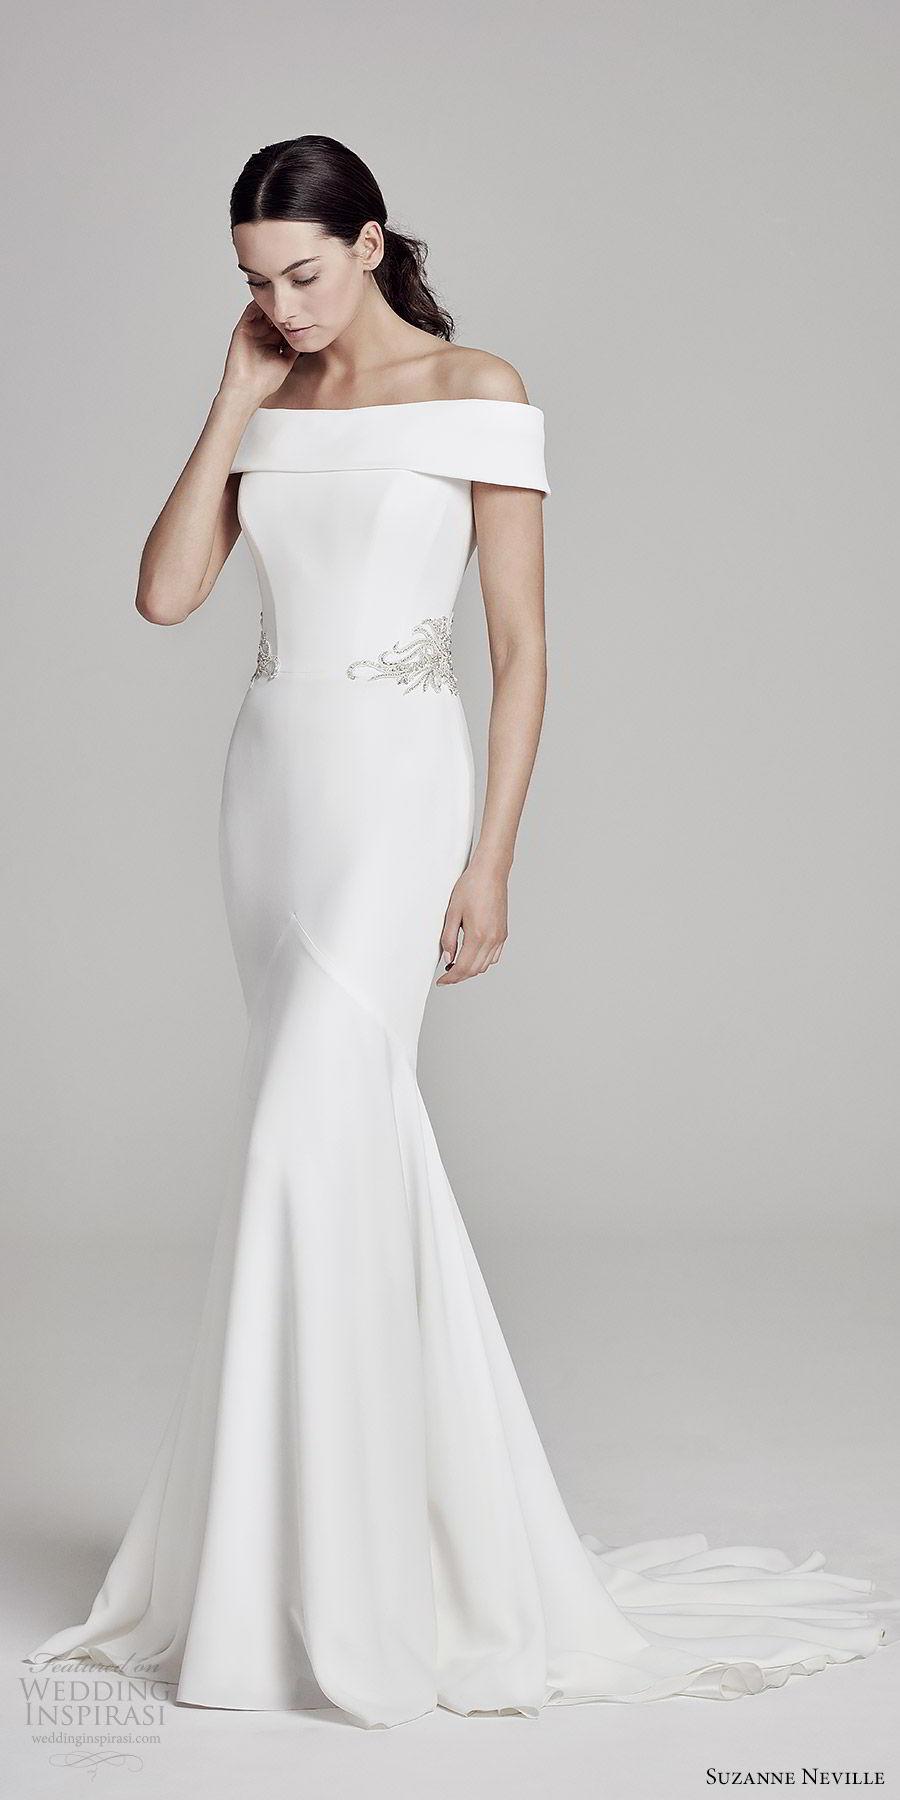 suzanne neville bridal 2019 off shoulder straight across embellished waist sheath wedding dress (orianna) chapel train modern clean elegant mv